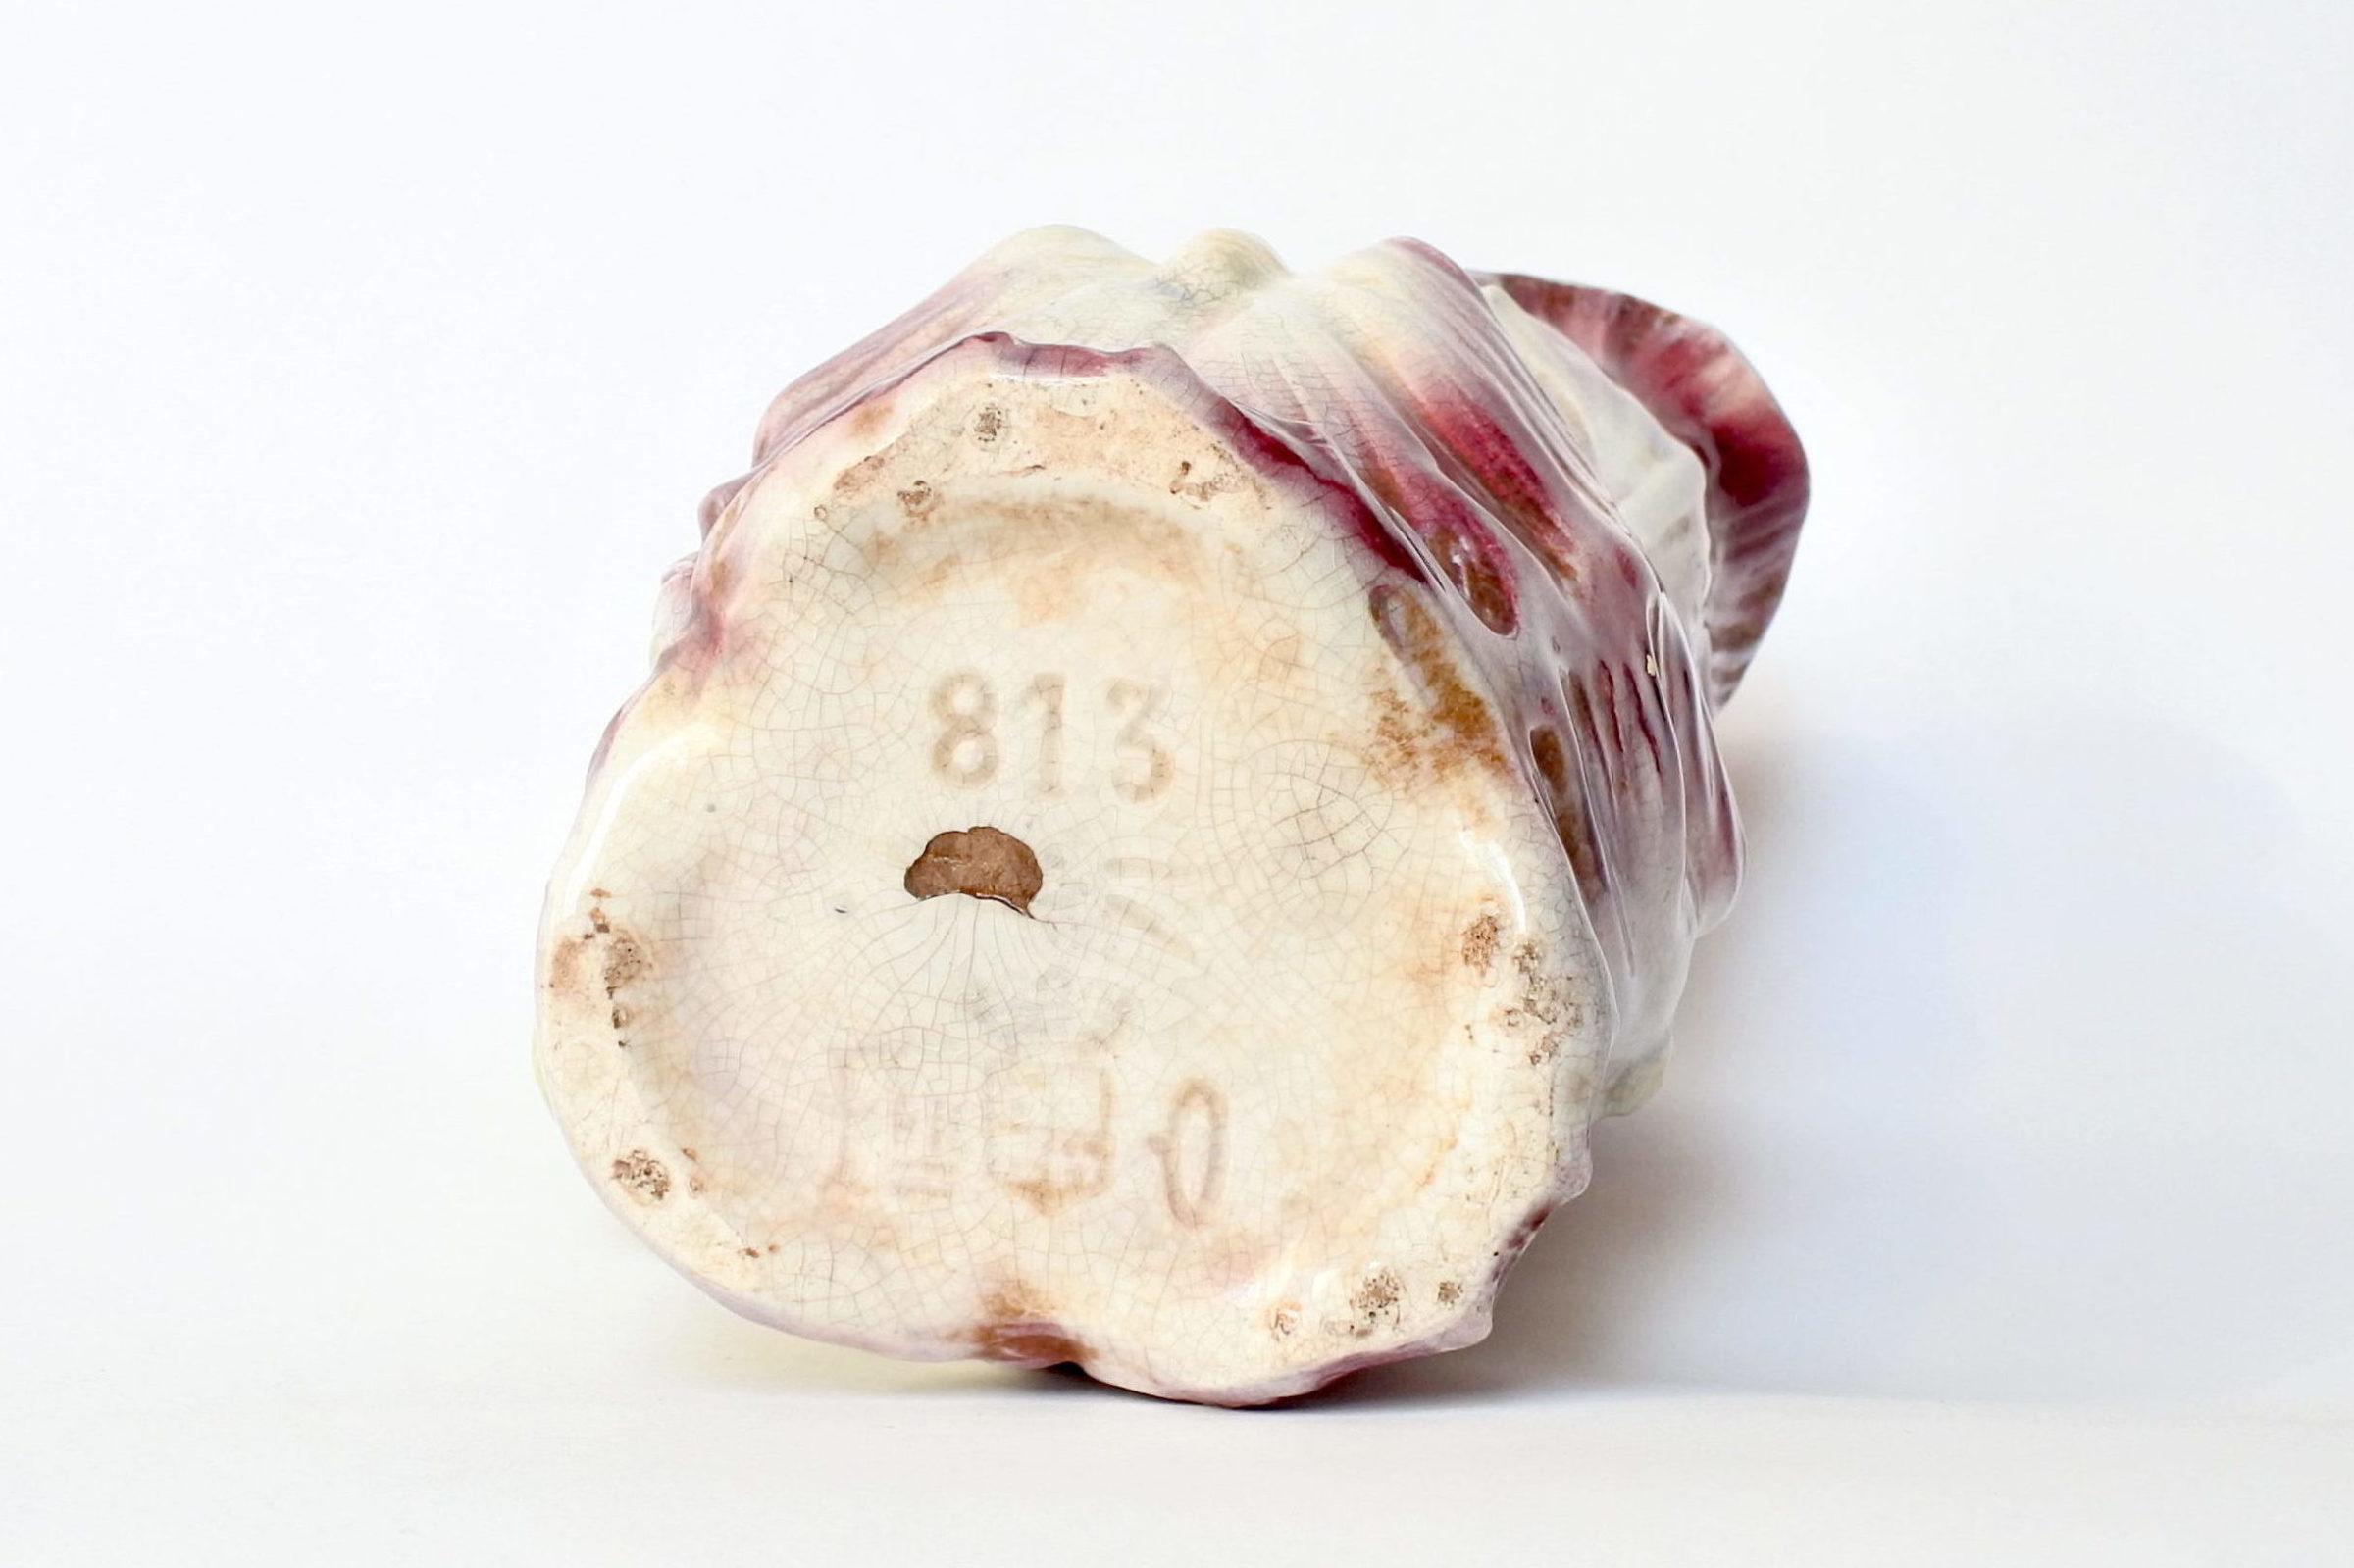 Brocca in ceramica barbotine a forma di iris - Onnaing n° 813 - 7